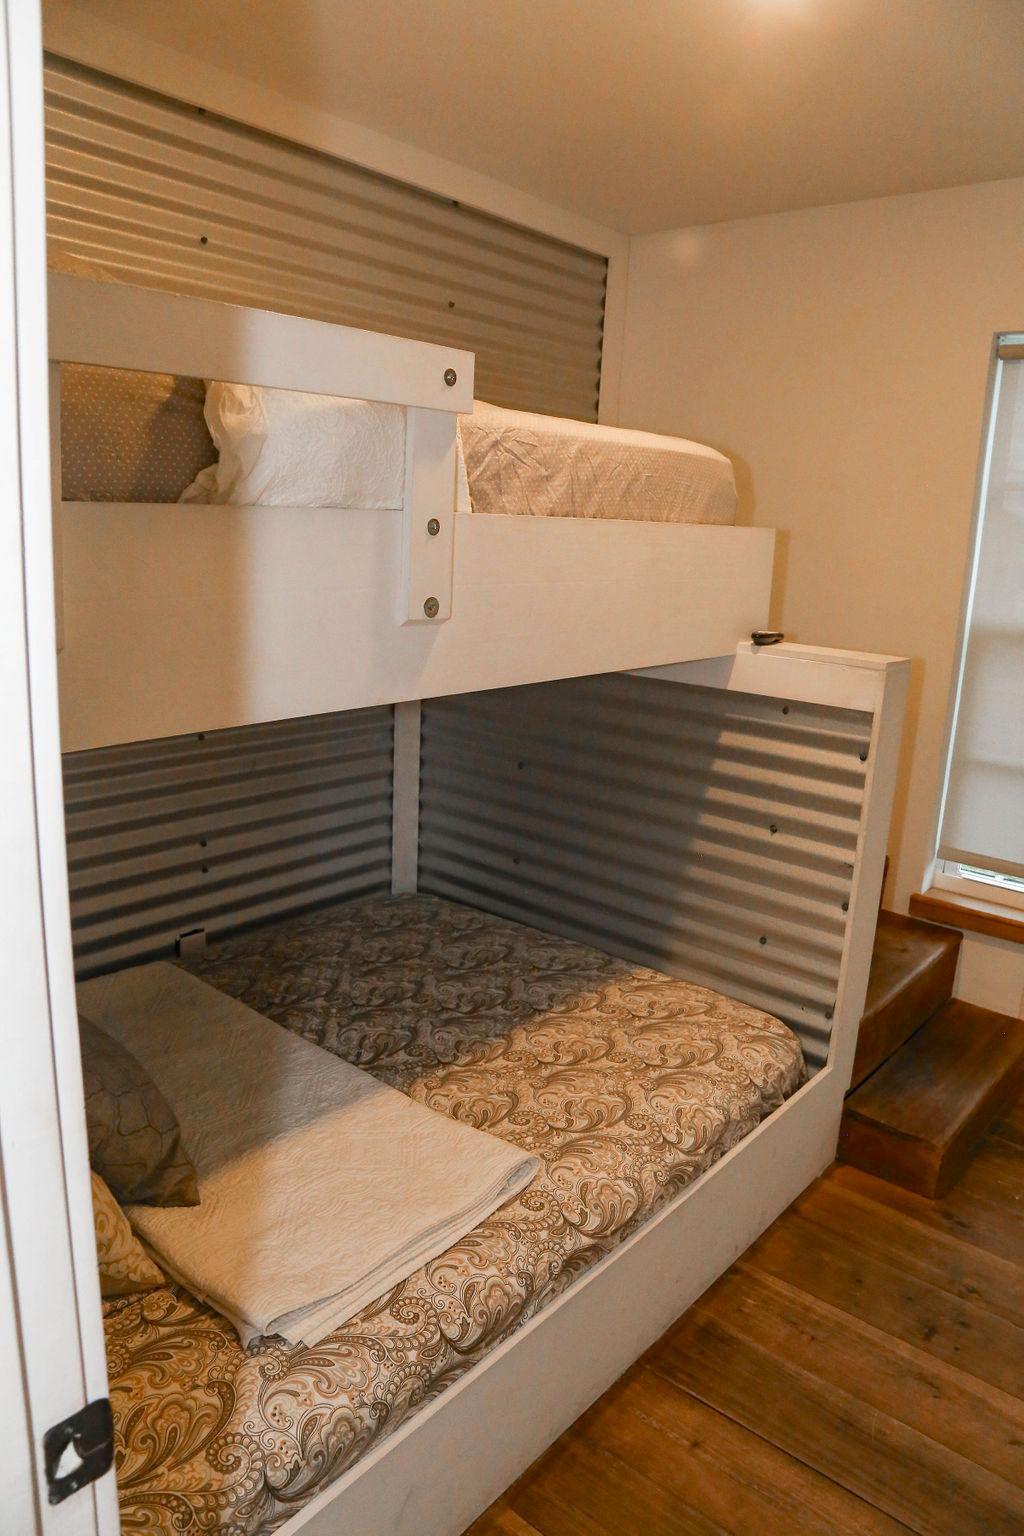 BR # 3 has full bed/twin bunk, flat screen